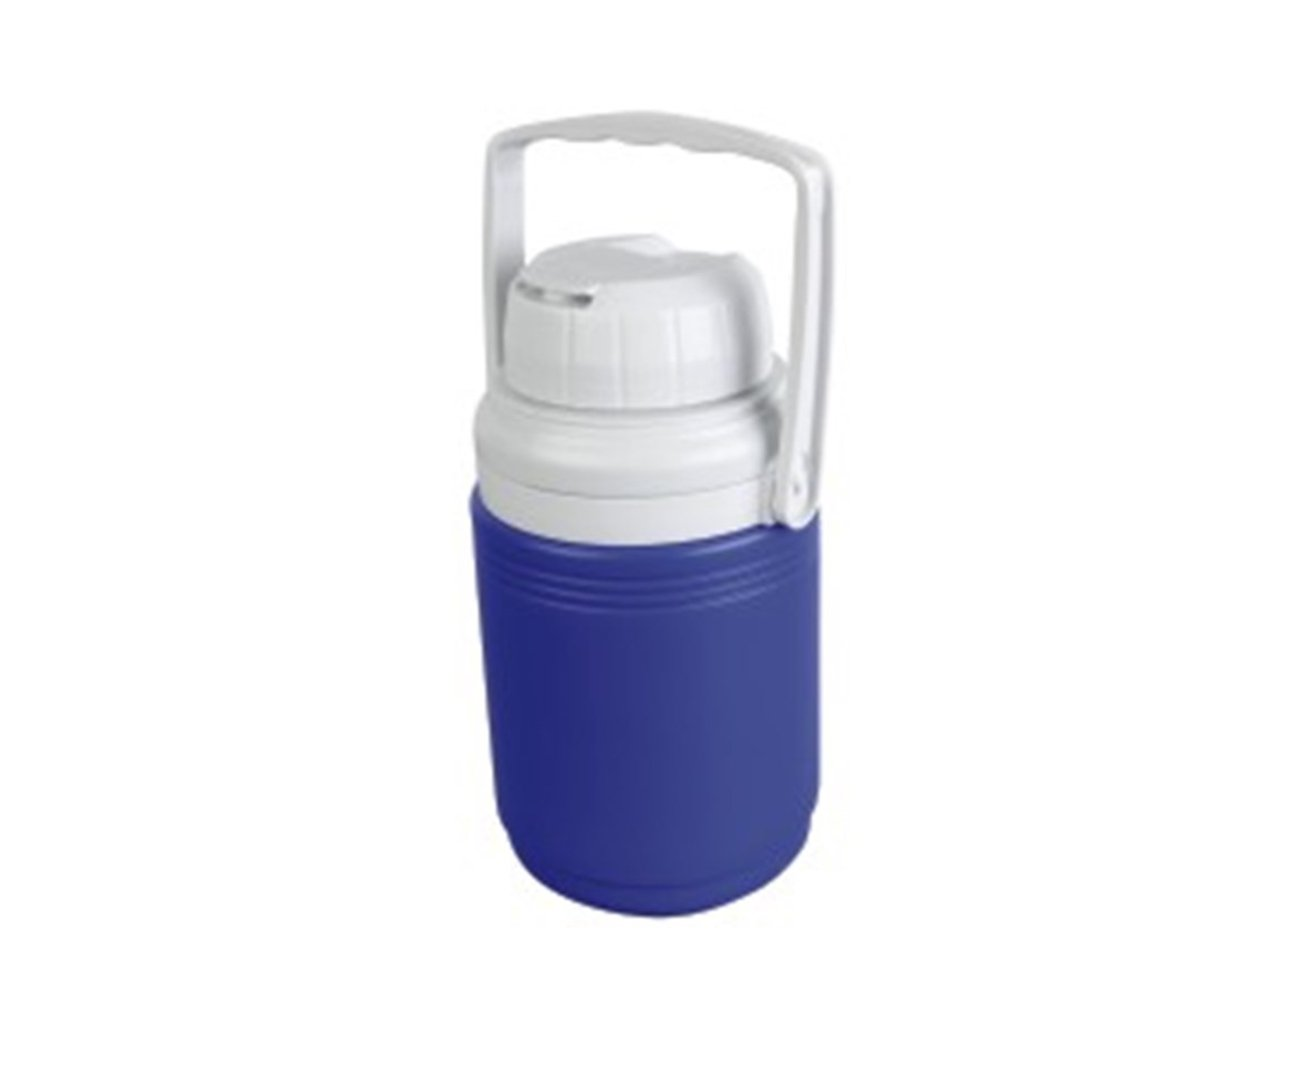 Garrafa Térmica 1,2 Ltr Azul - Coleman